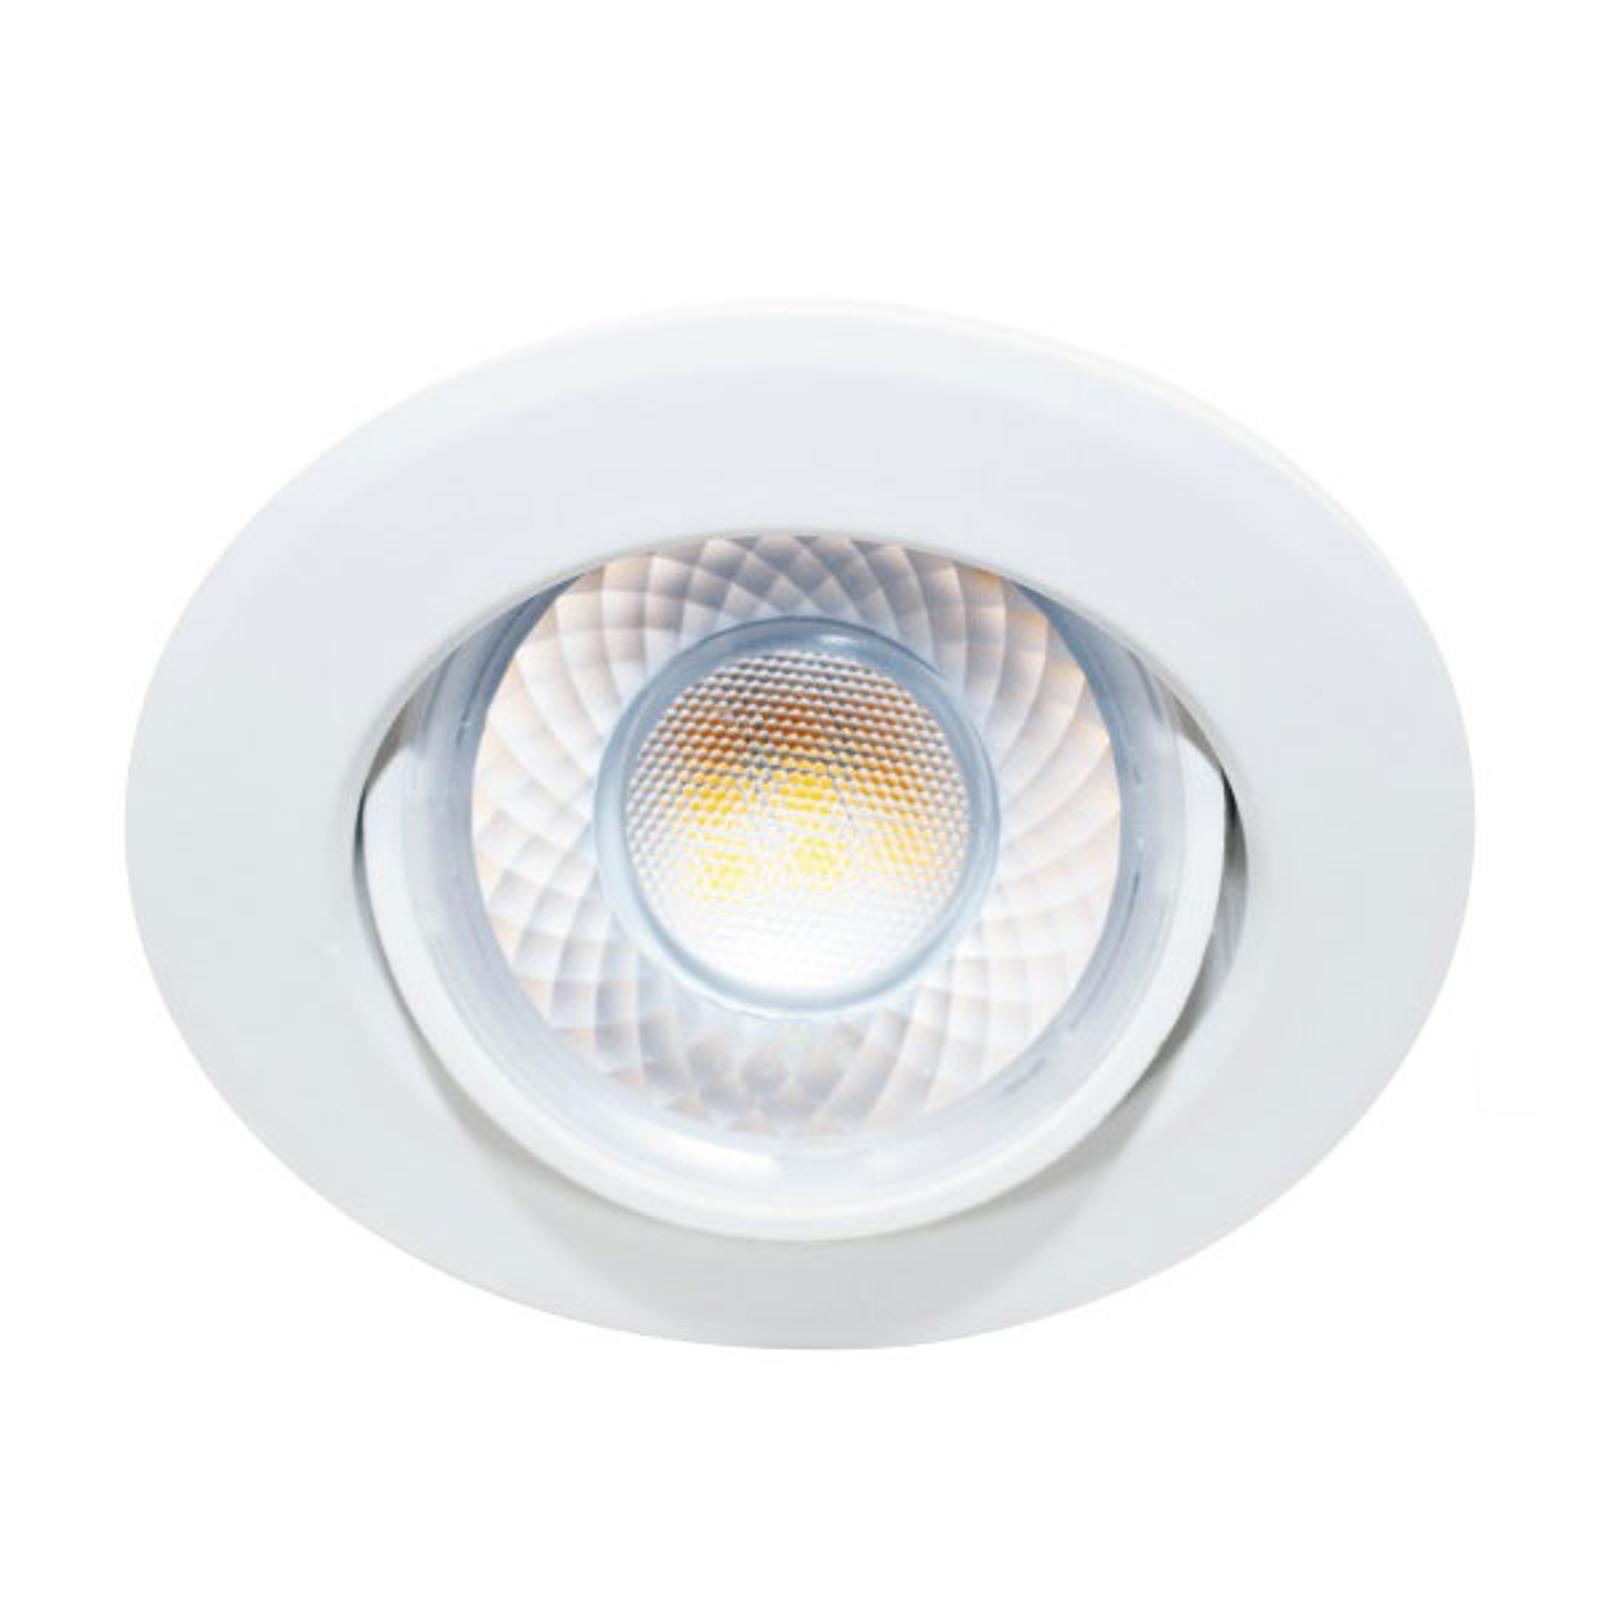 LED-Einbaustrahler Dekto 7,8cm 38° 8W Ra90 2.700K